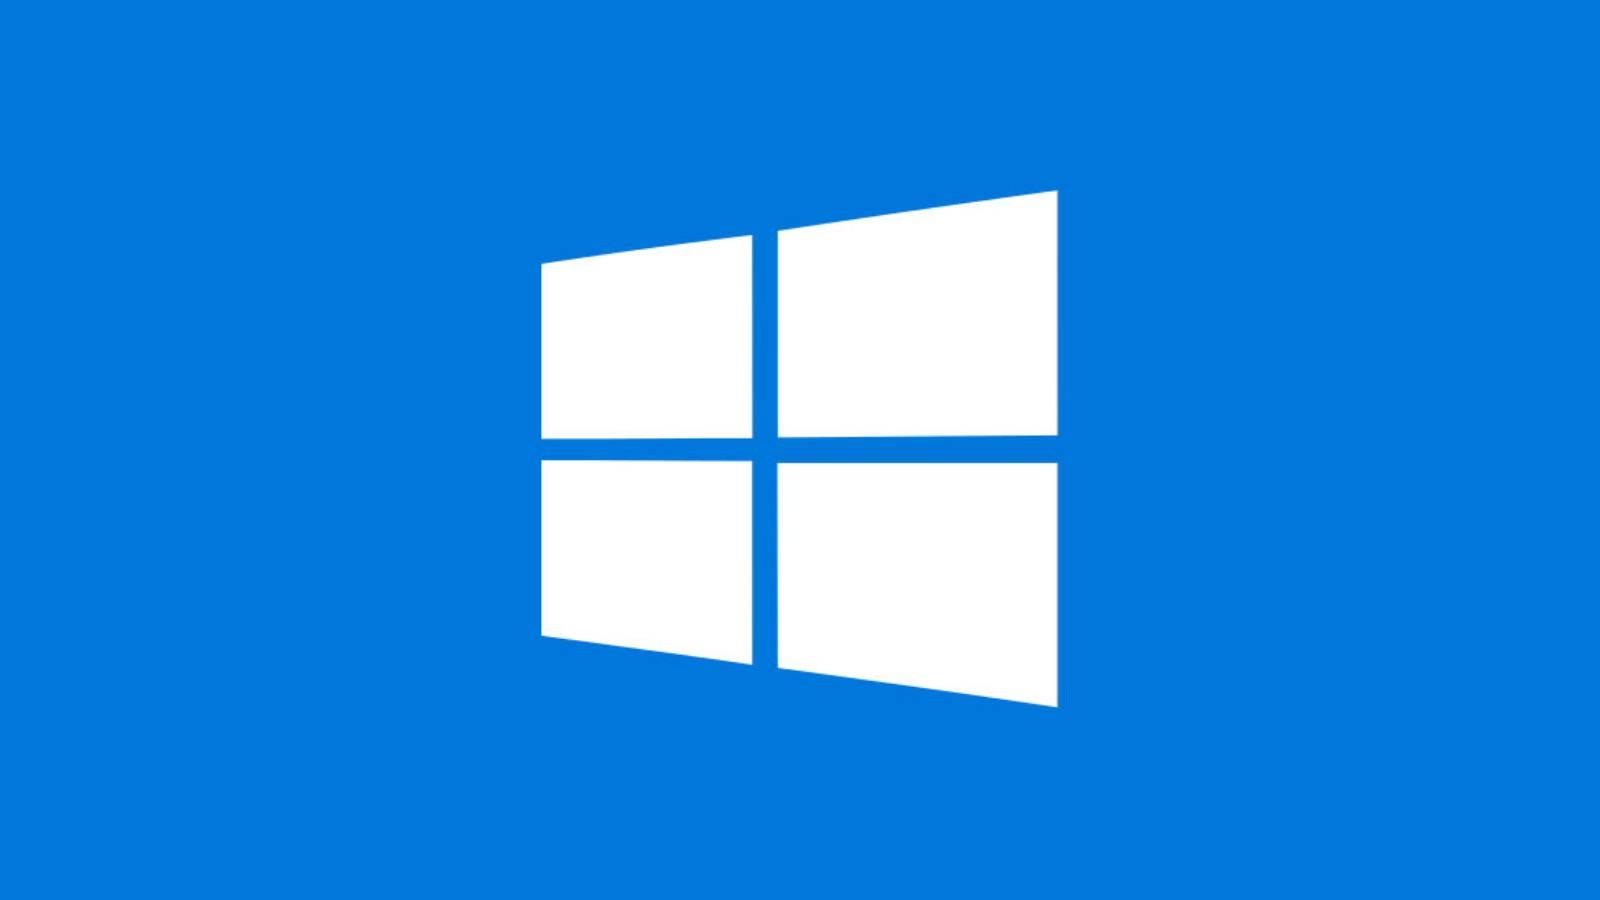 Windows 10 spatial